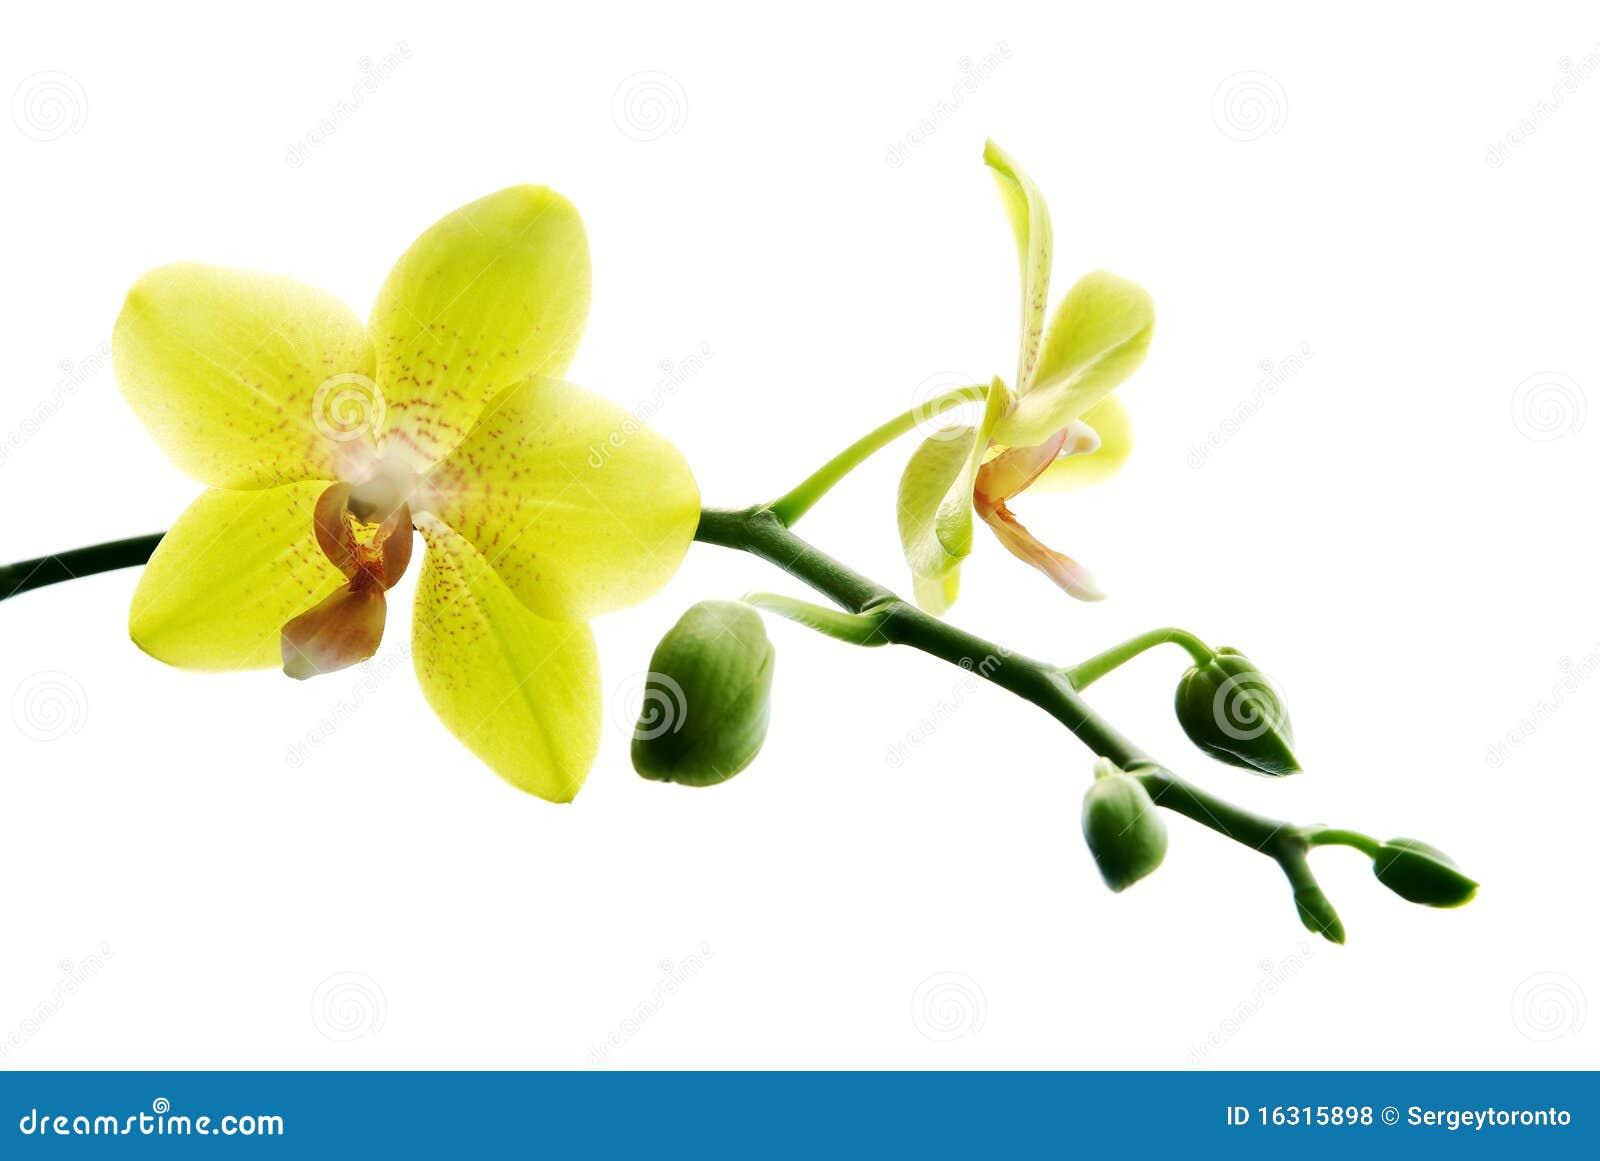 Orchid Cymbidium White Fresh Yellow Orchids R...